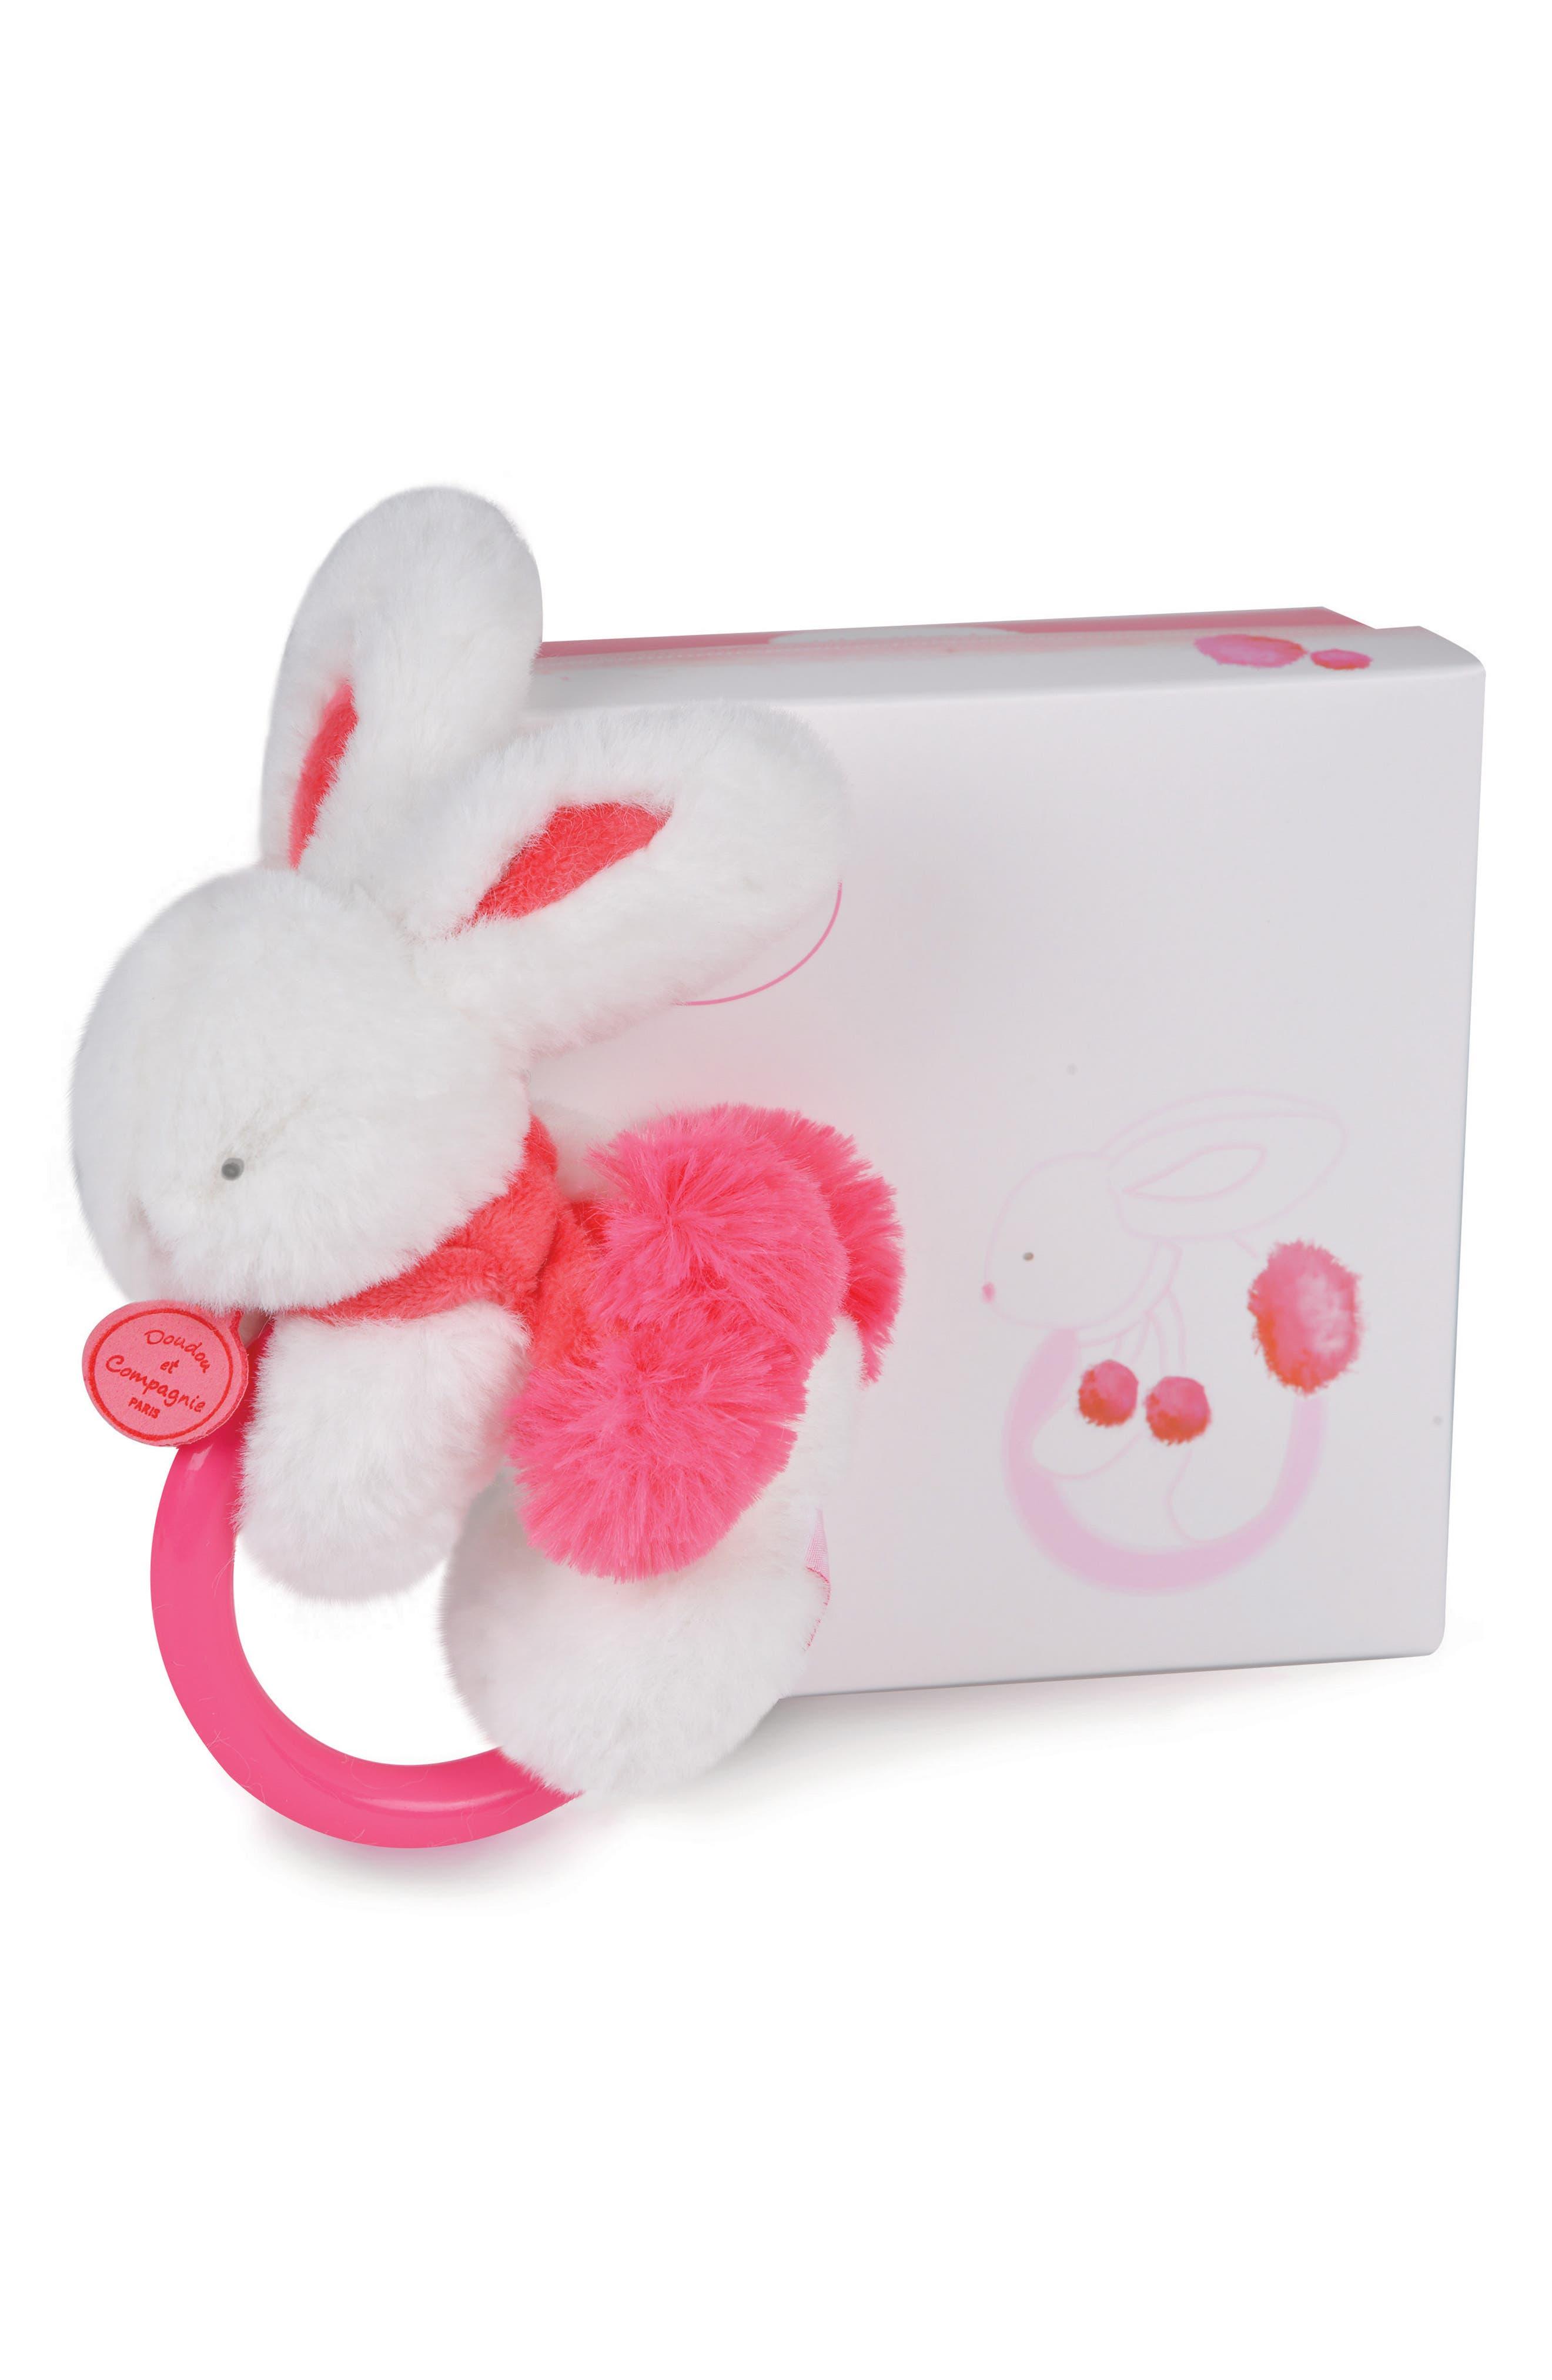 Strawberry Pink Bunny Rattle & Lovie Blanket Gift Set,                             Alternate thumbnail 2, color,                             Strawberry Pink